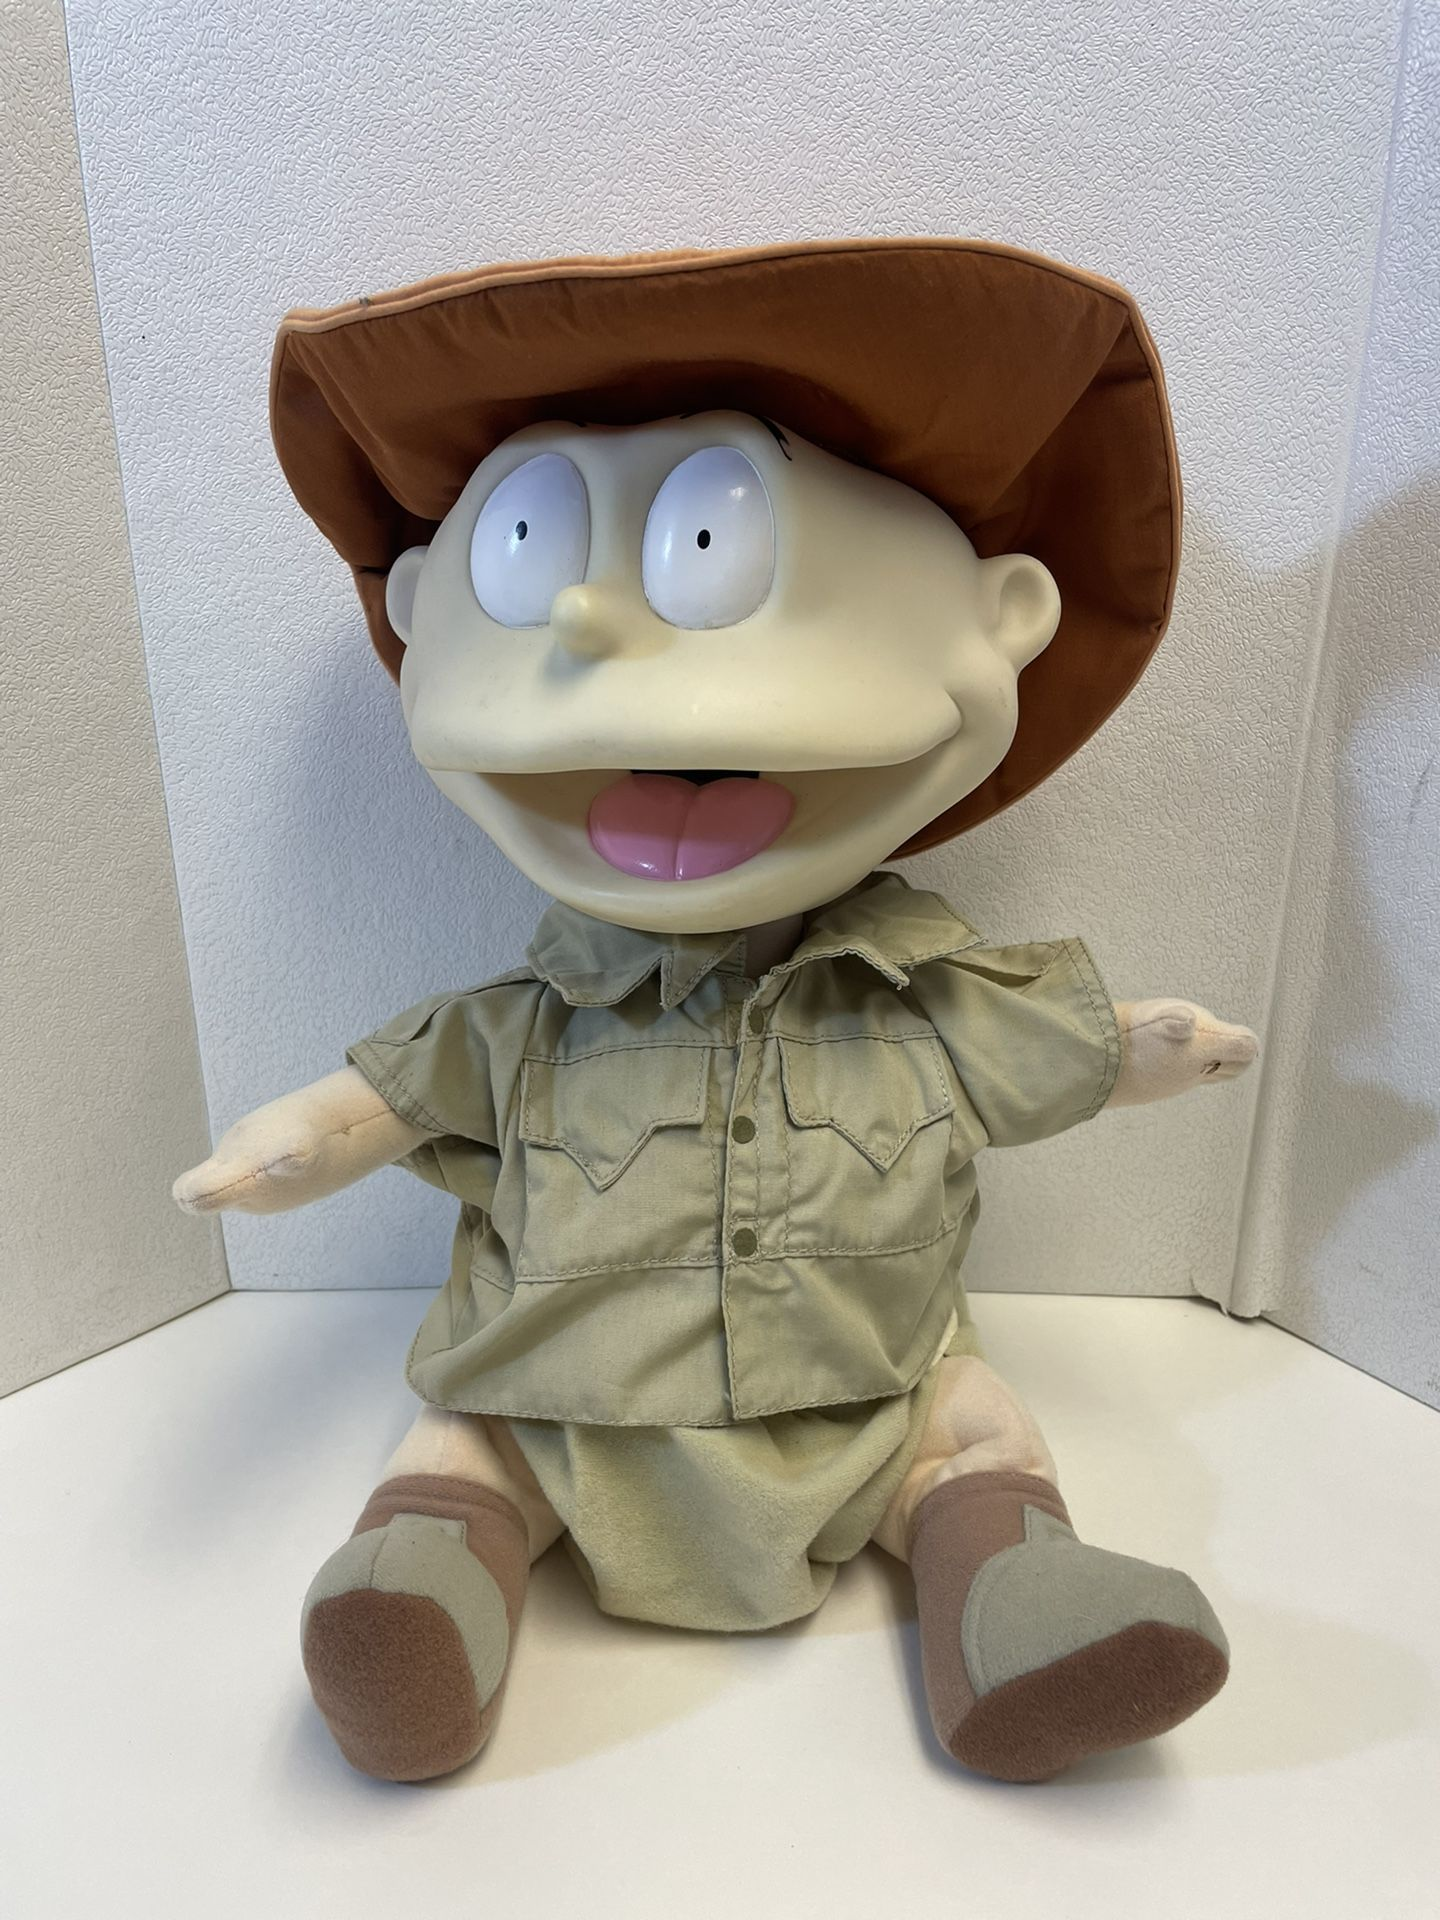 "Vintage 1998 Tommy Pickles Safari Talking Rugrats Plush Doll Figure 17"" Tested"